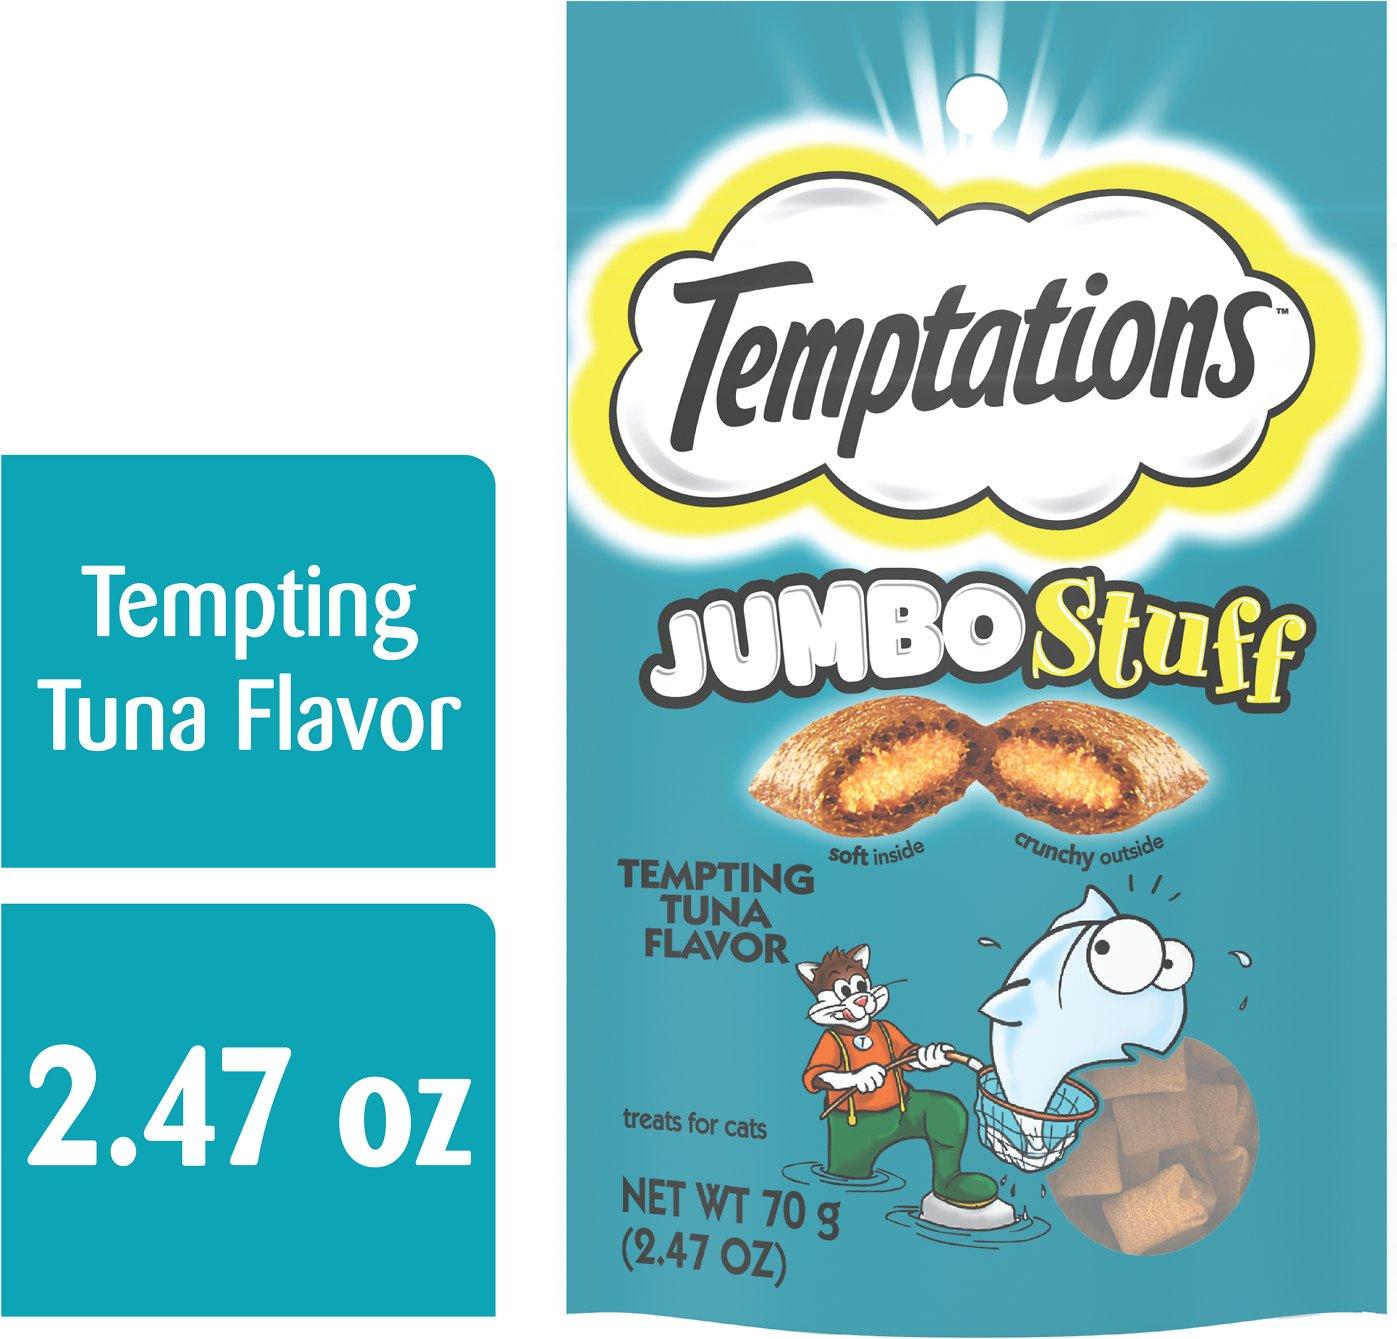 Chewy has temptations cat treats on sale 2.5oz/bag $0.25